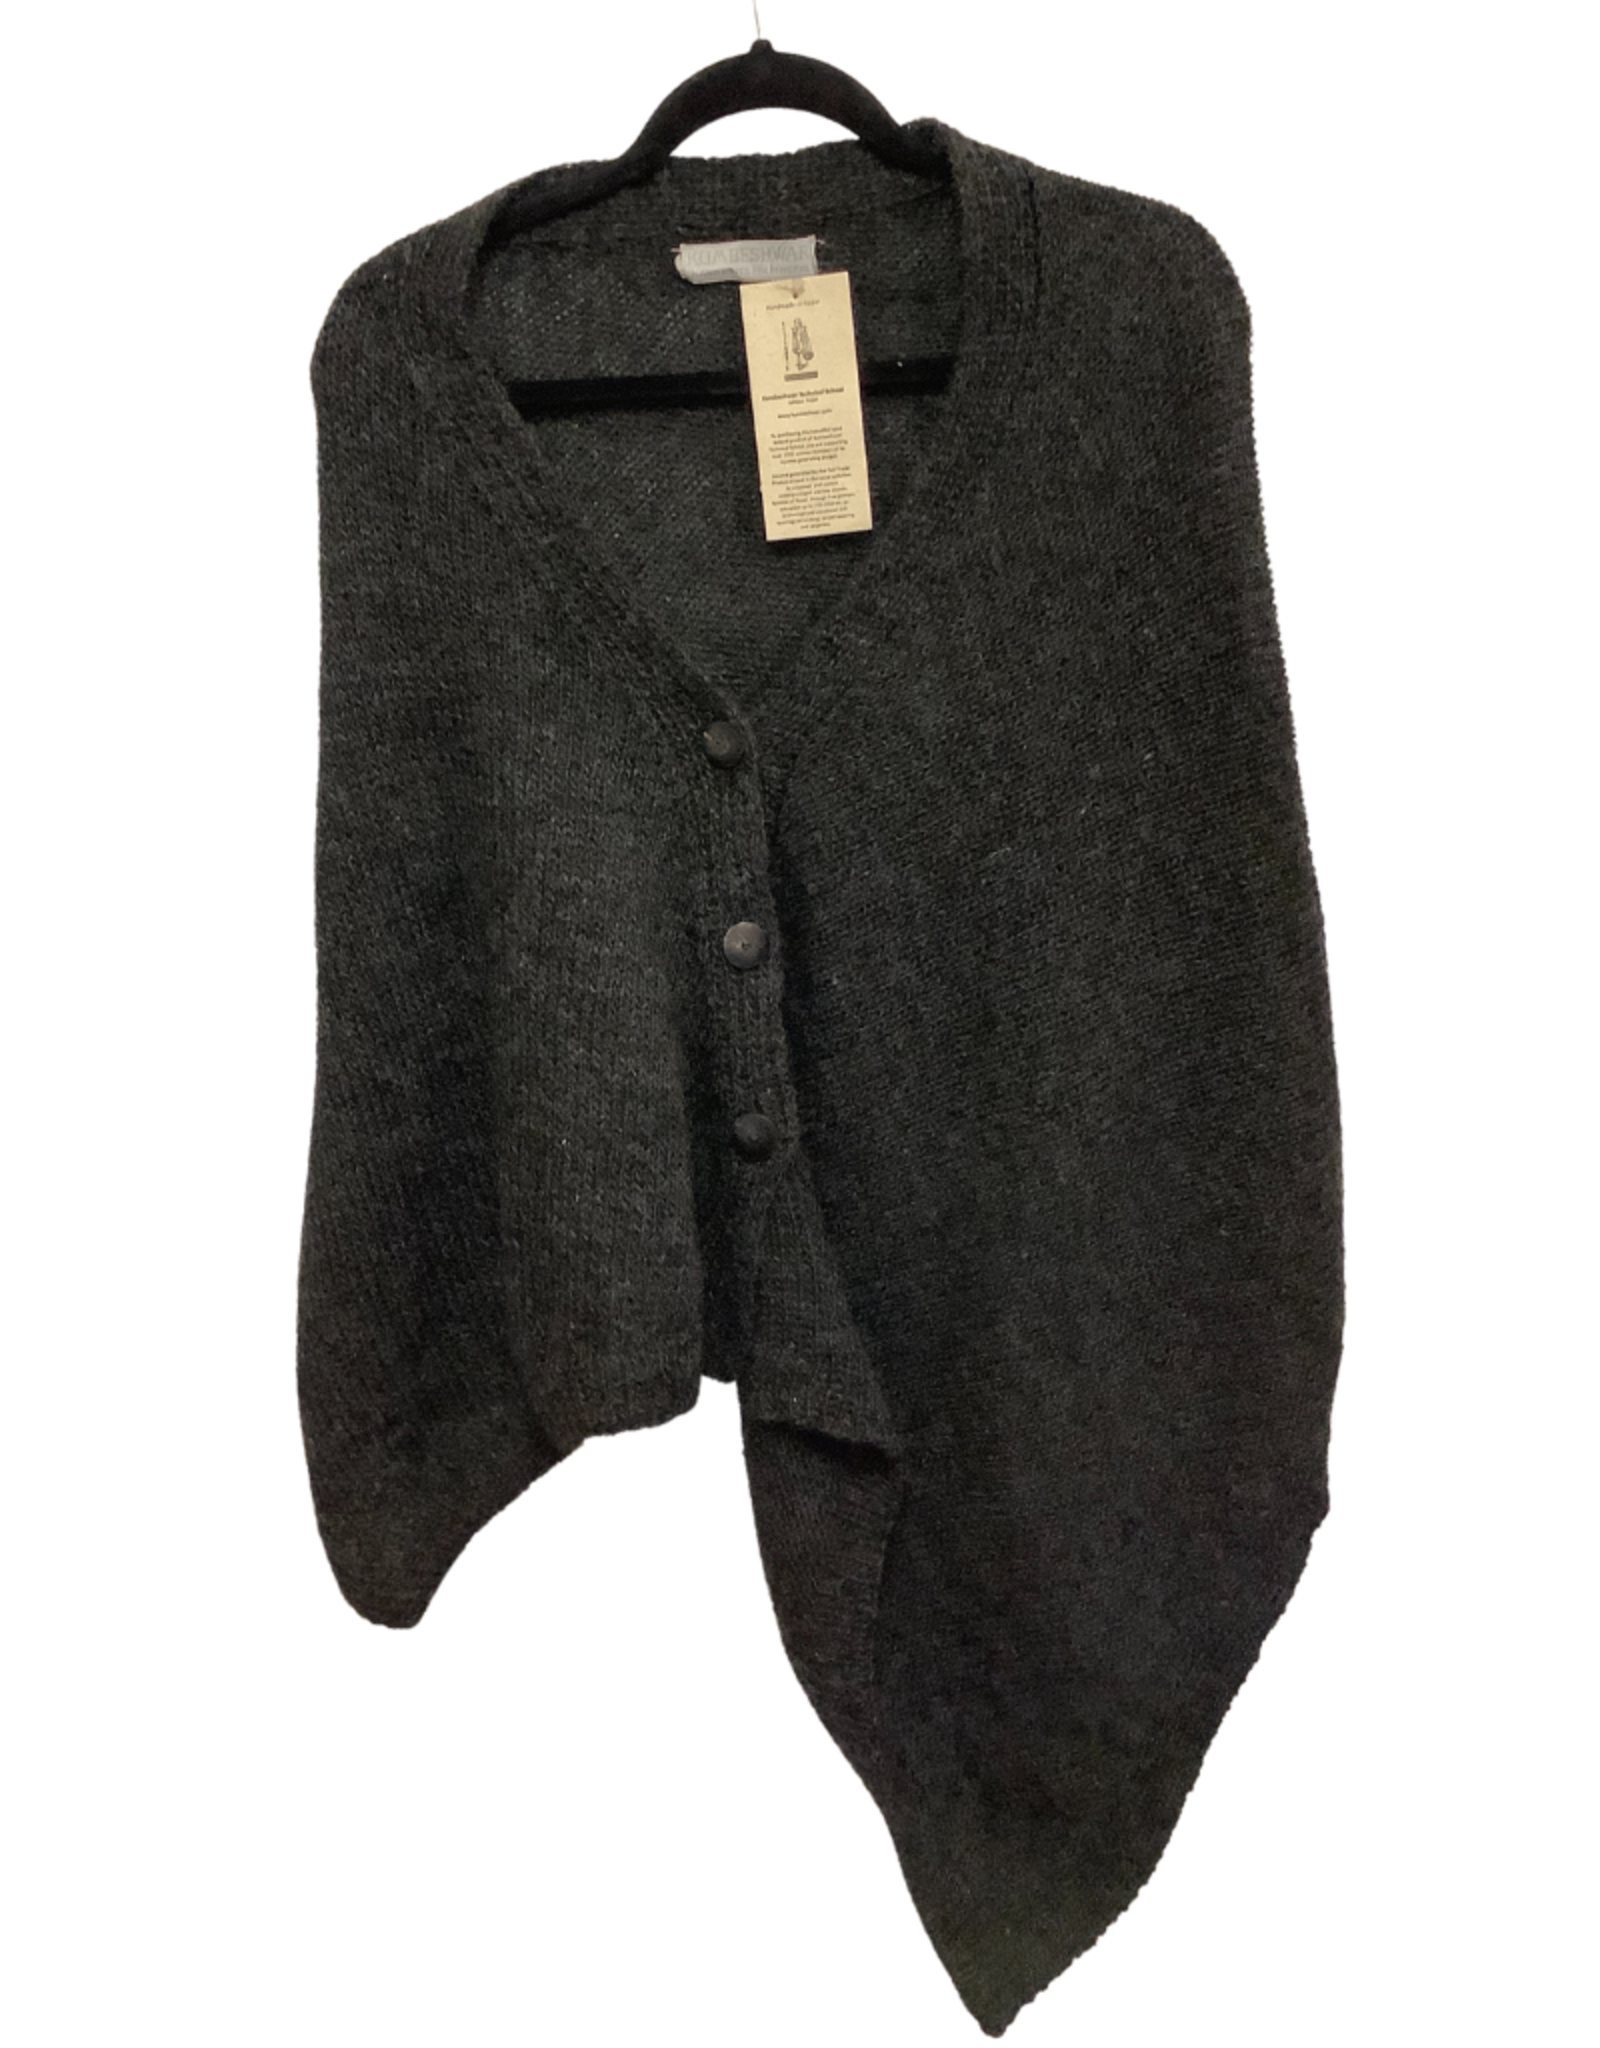 Kumbeshwar Technical School Shawl w/2 Buttons Charcoal Grey Wool